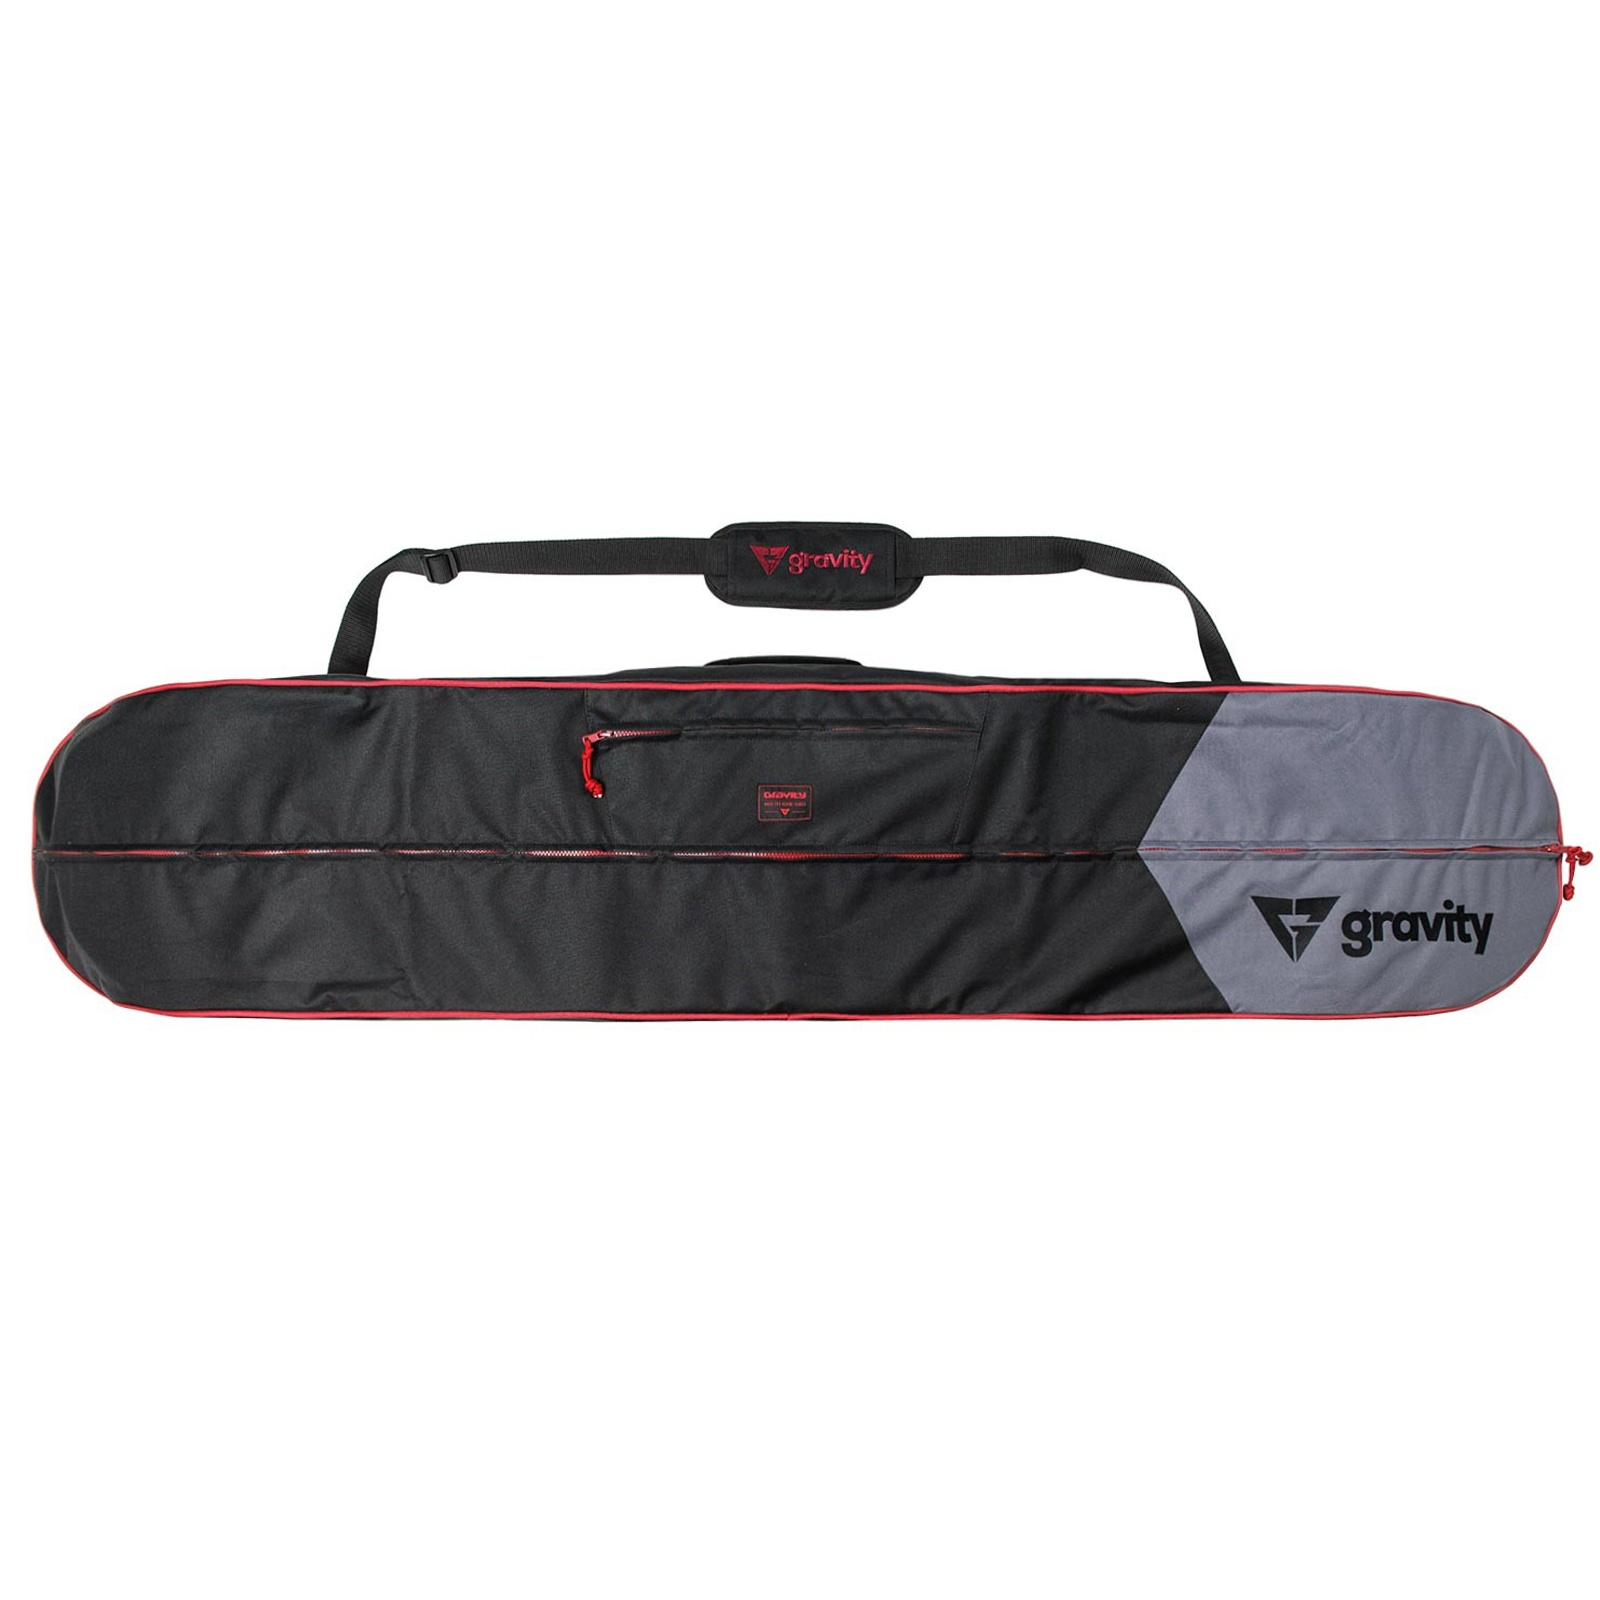 Obal na snowboard GRAVITY Icon černo-červený - vel. 175 cm